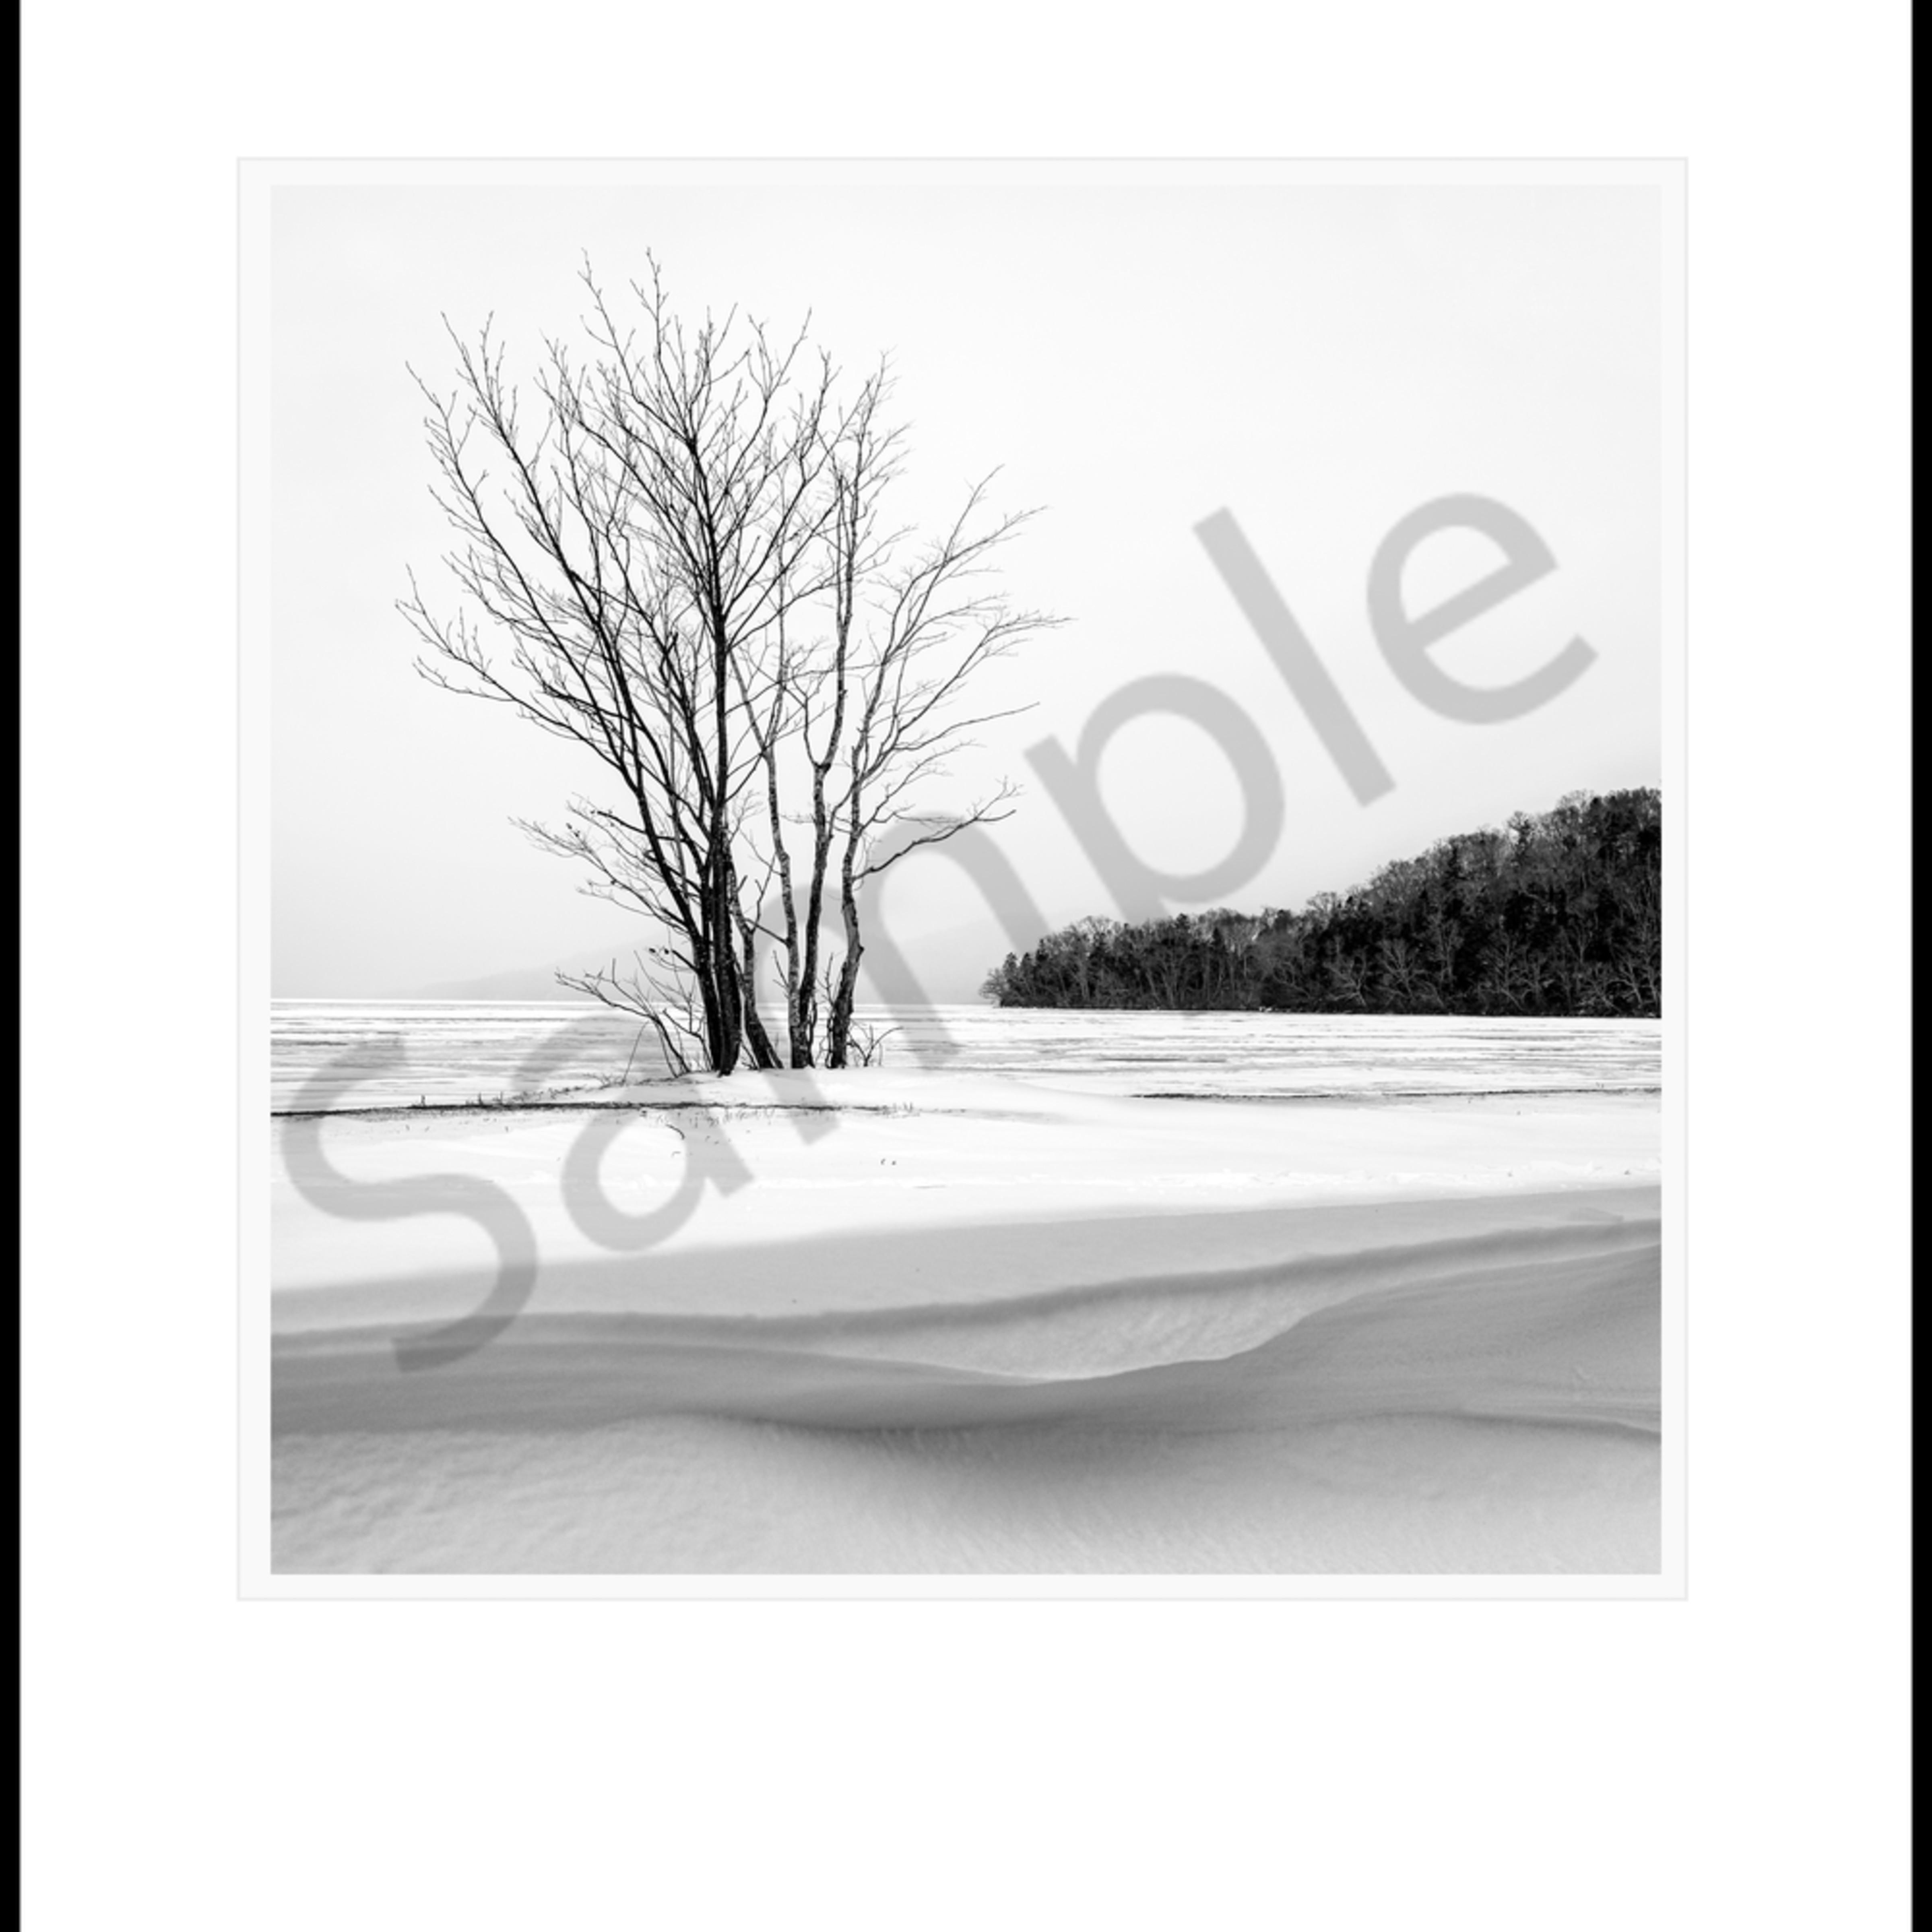 Snow drift lls8ax